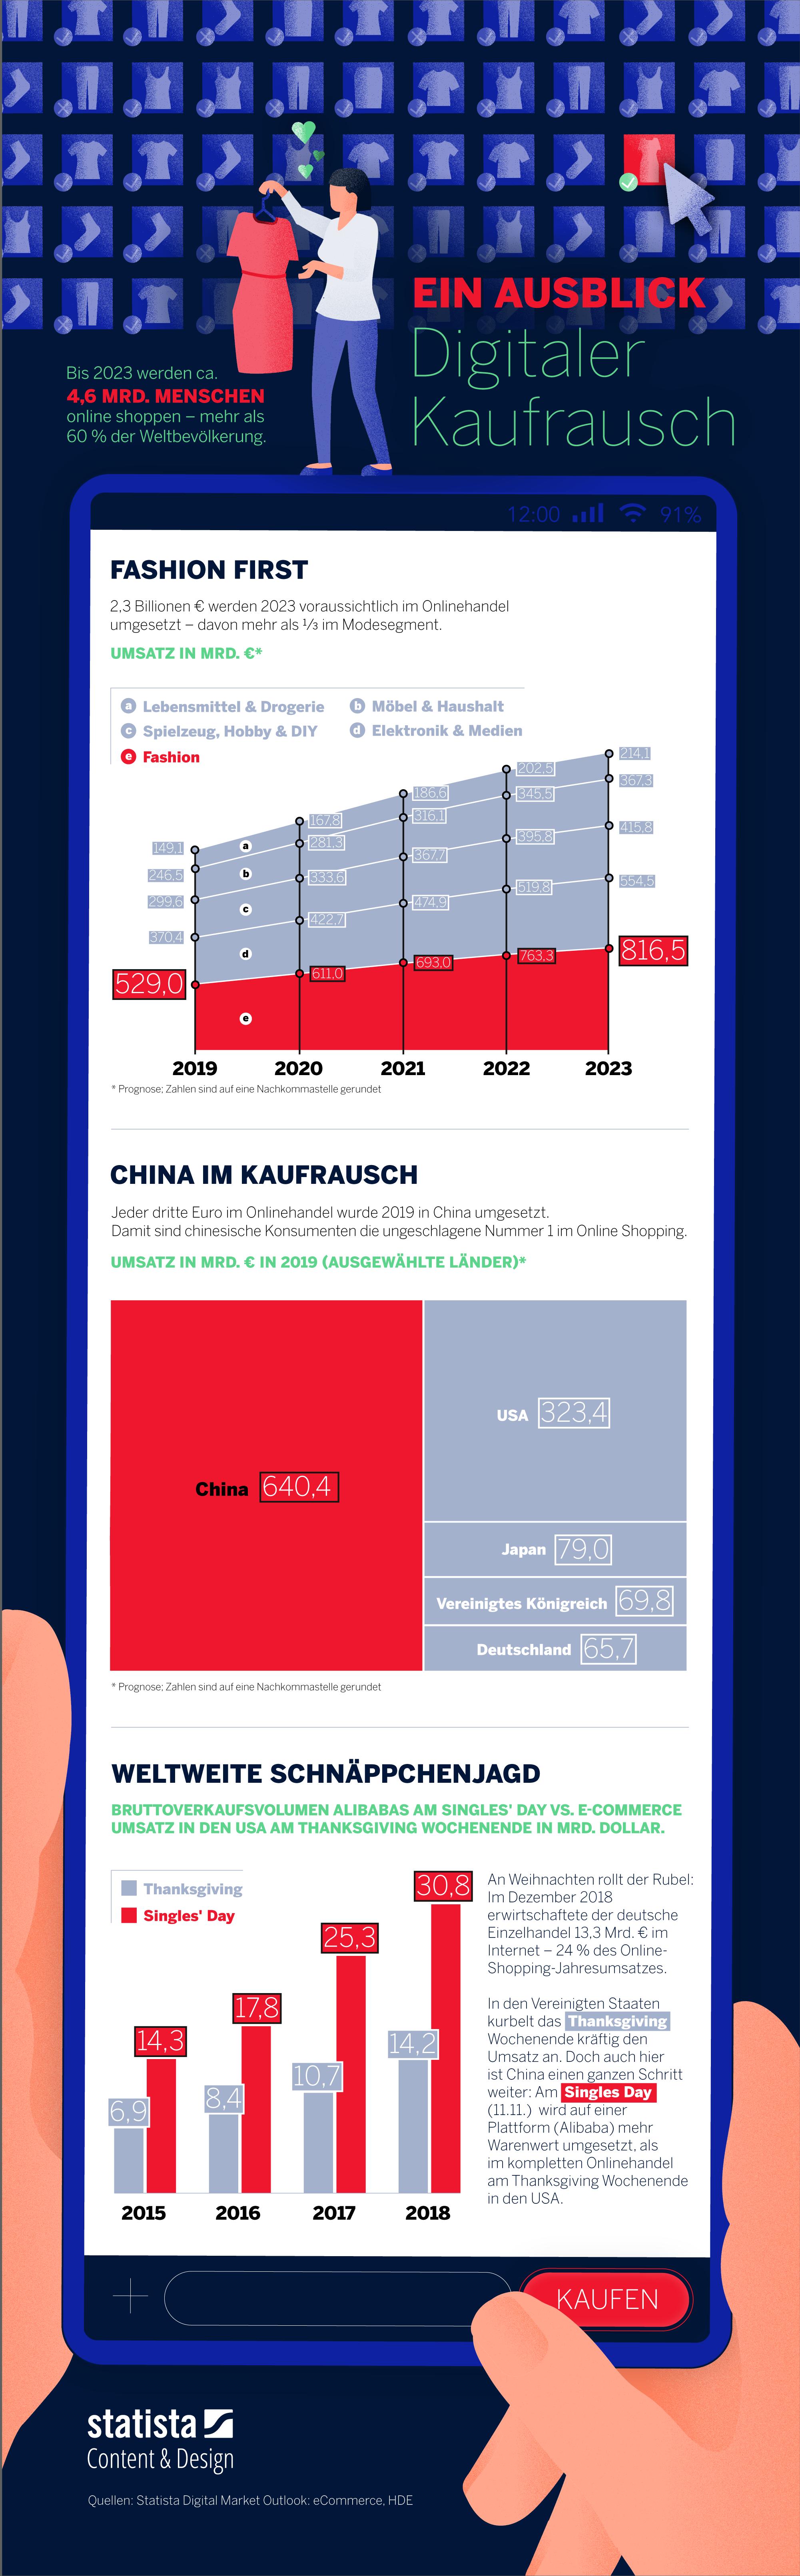 Infografik: Shoppingrausch im Internet | Statista